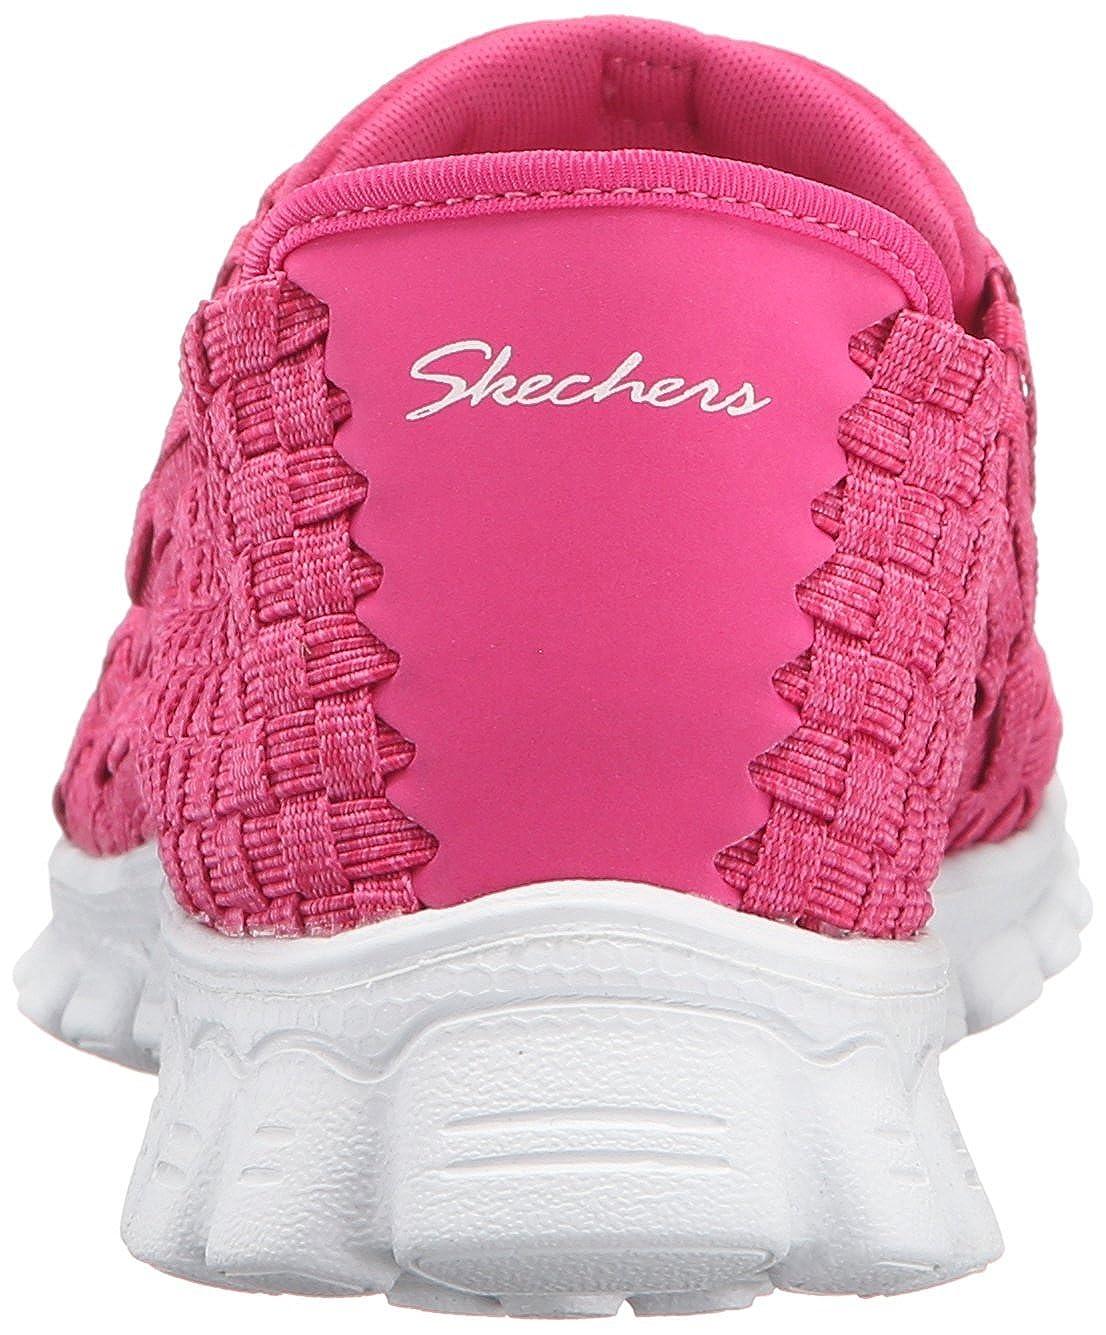 Skechers Sport Easy Flex 2 Pedestal Fashion Sneaker  Fucsia/Bianco